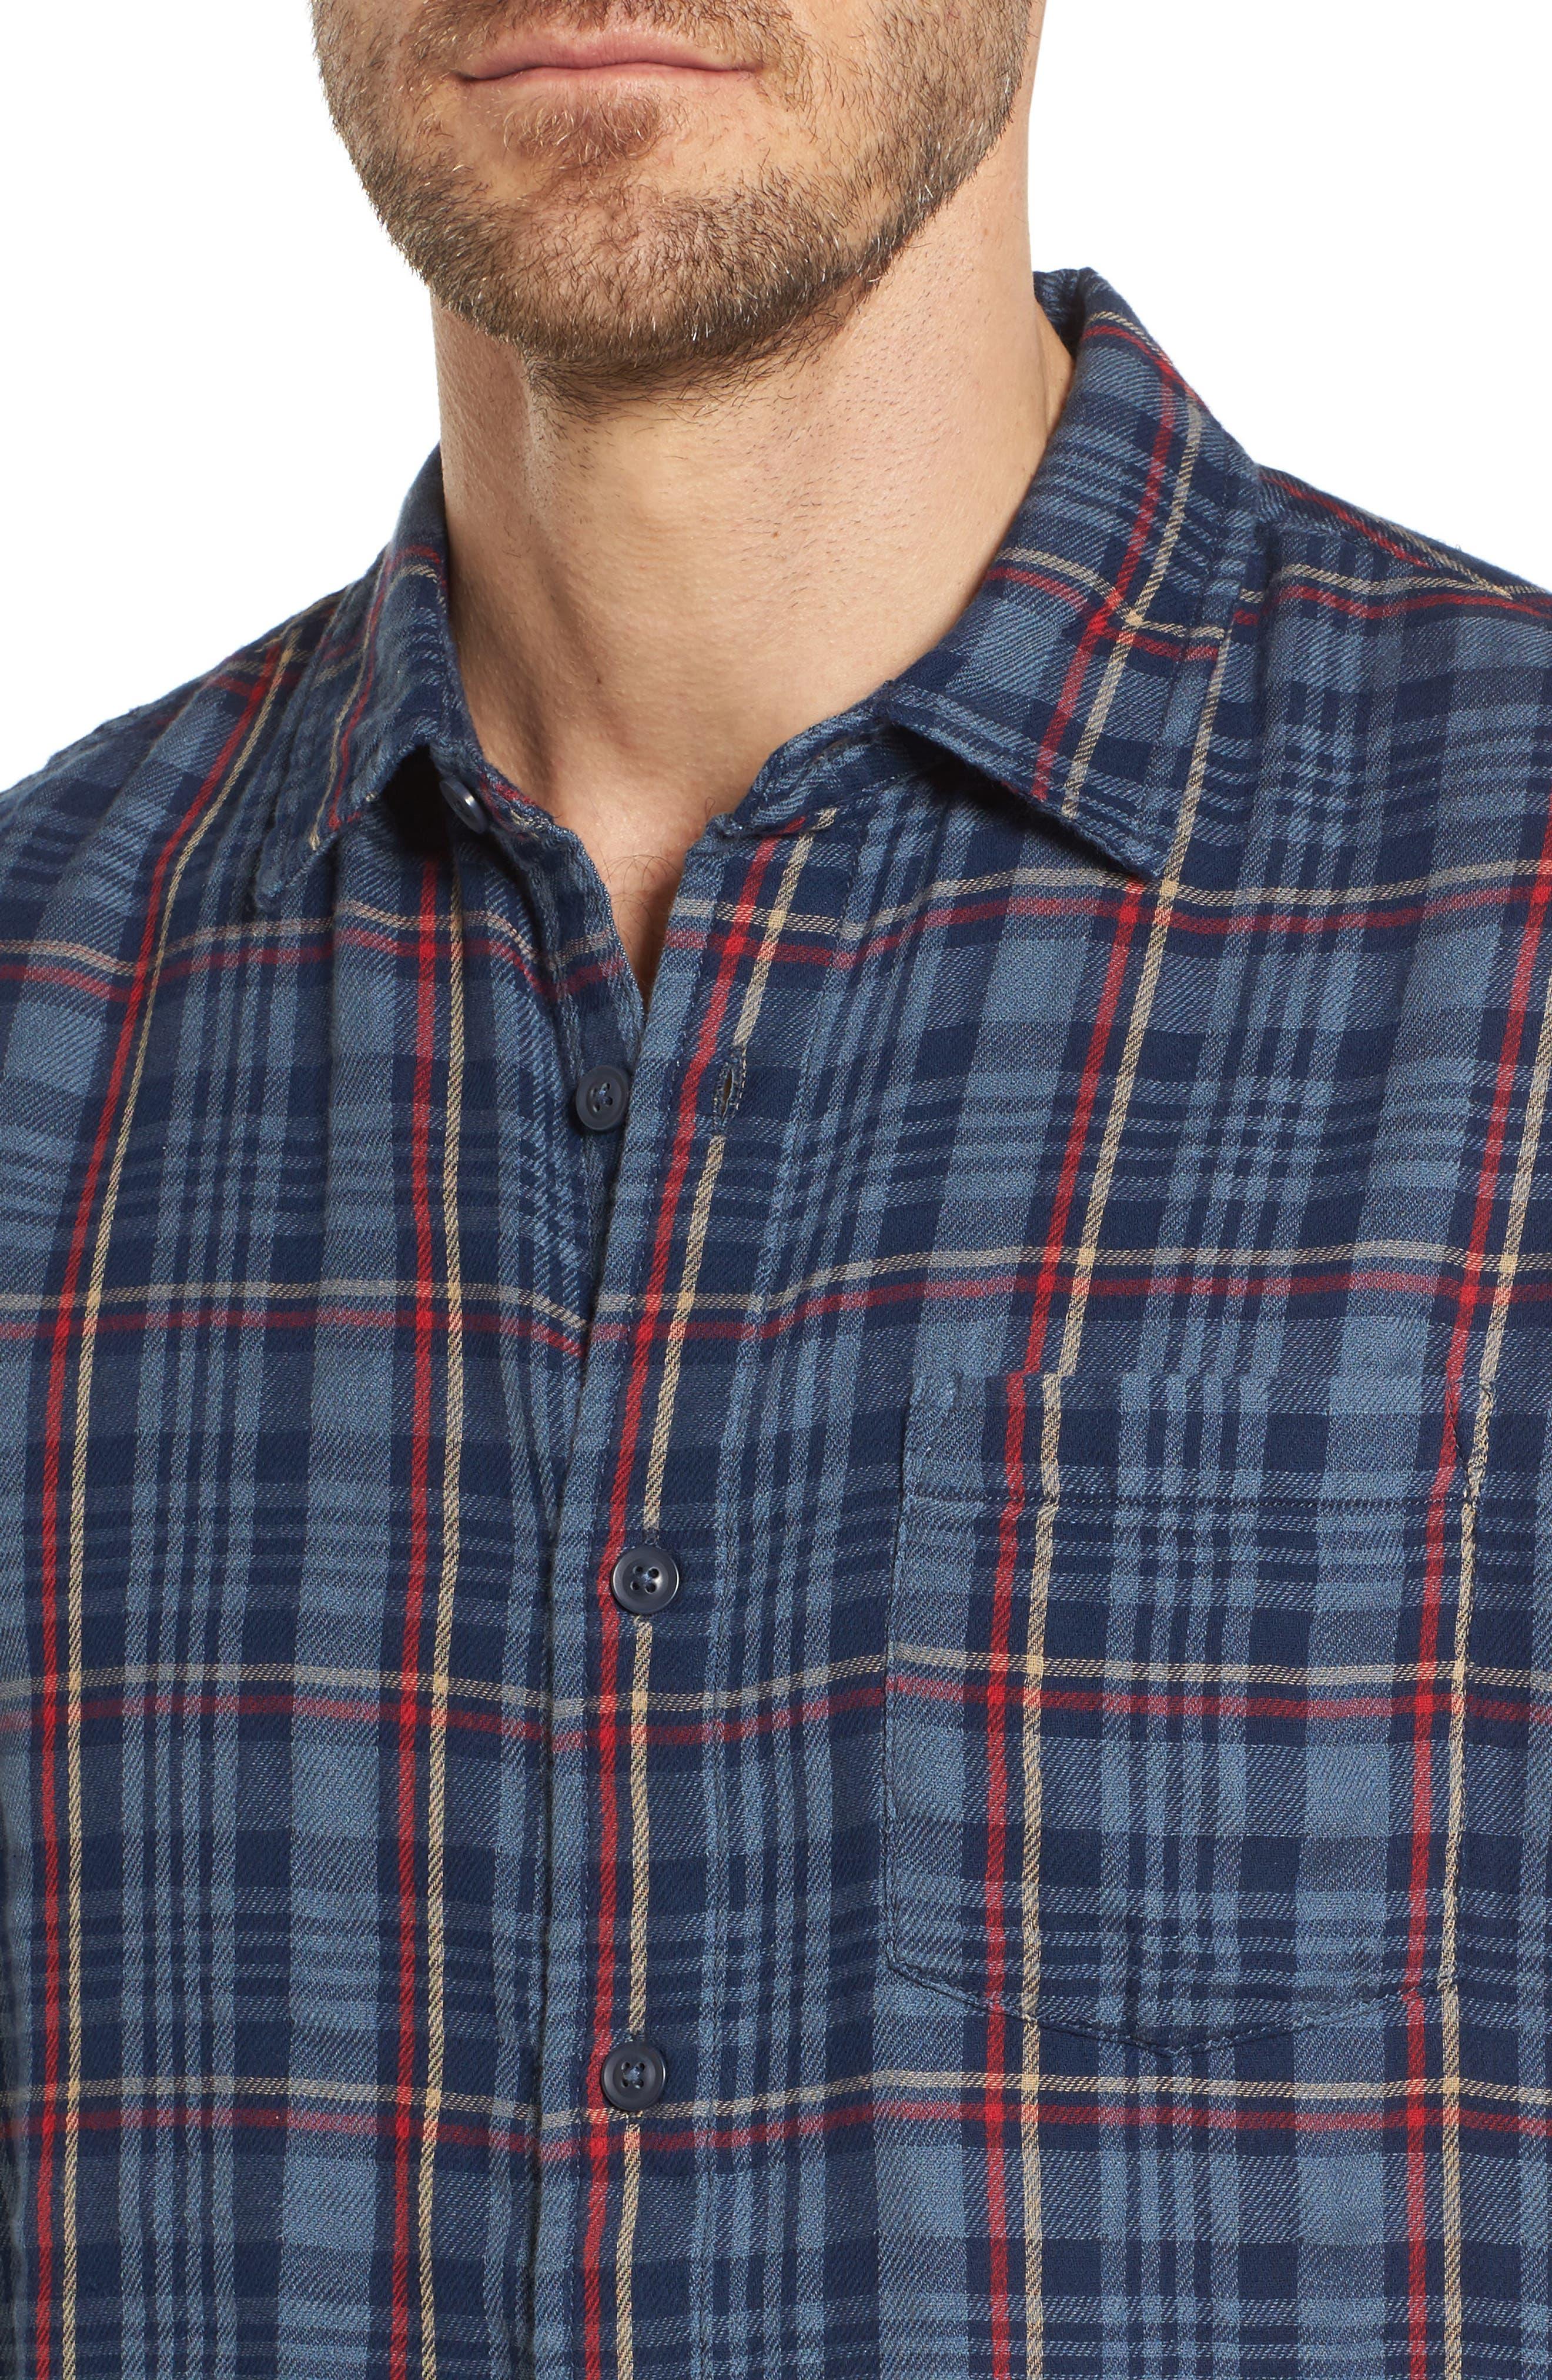 Alton Double Cloth Plaid Sport Shirt,                             Alternate thumbnail 4, color,                             Navy Grey Plaid